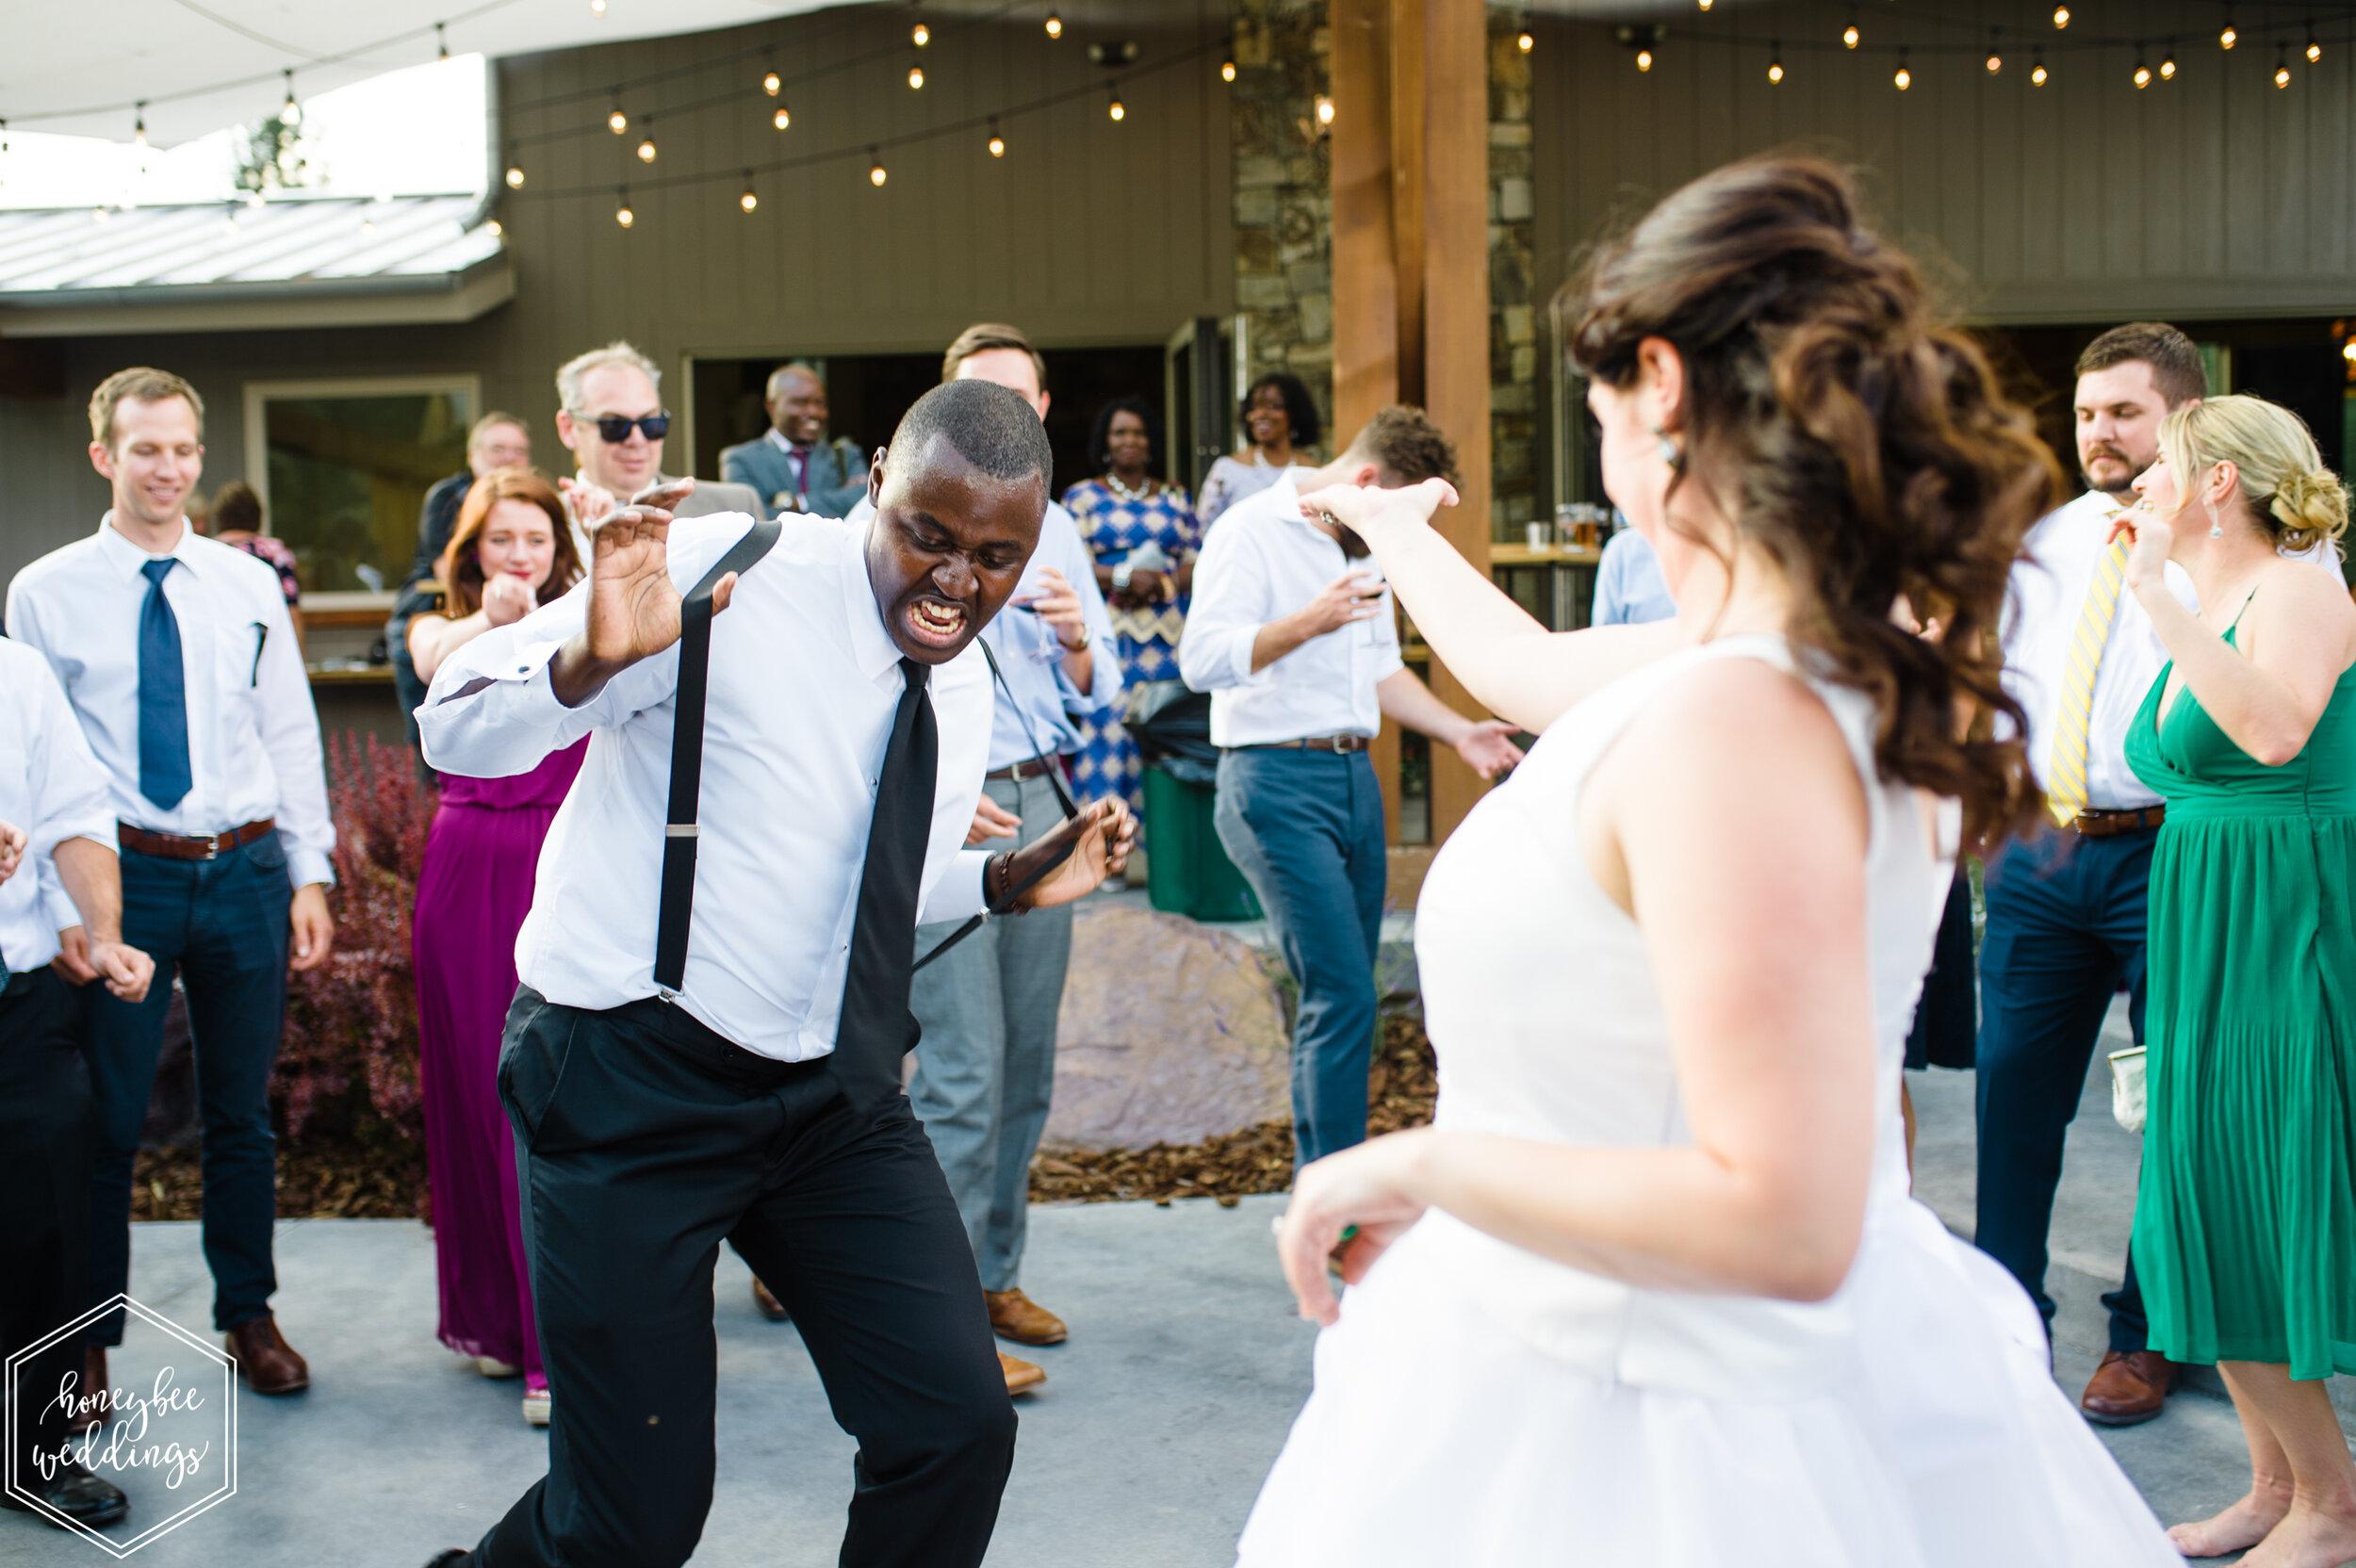 162White Raven Wedding_Montana Wedding Photographer_Rebekah & Likom_Honeybee Weddings_July 27, 2019-2696.jpg